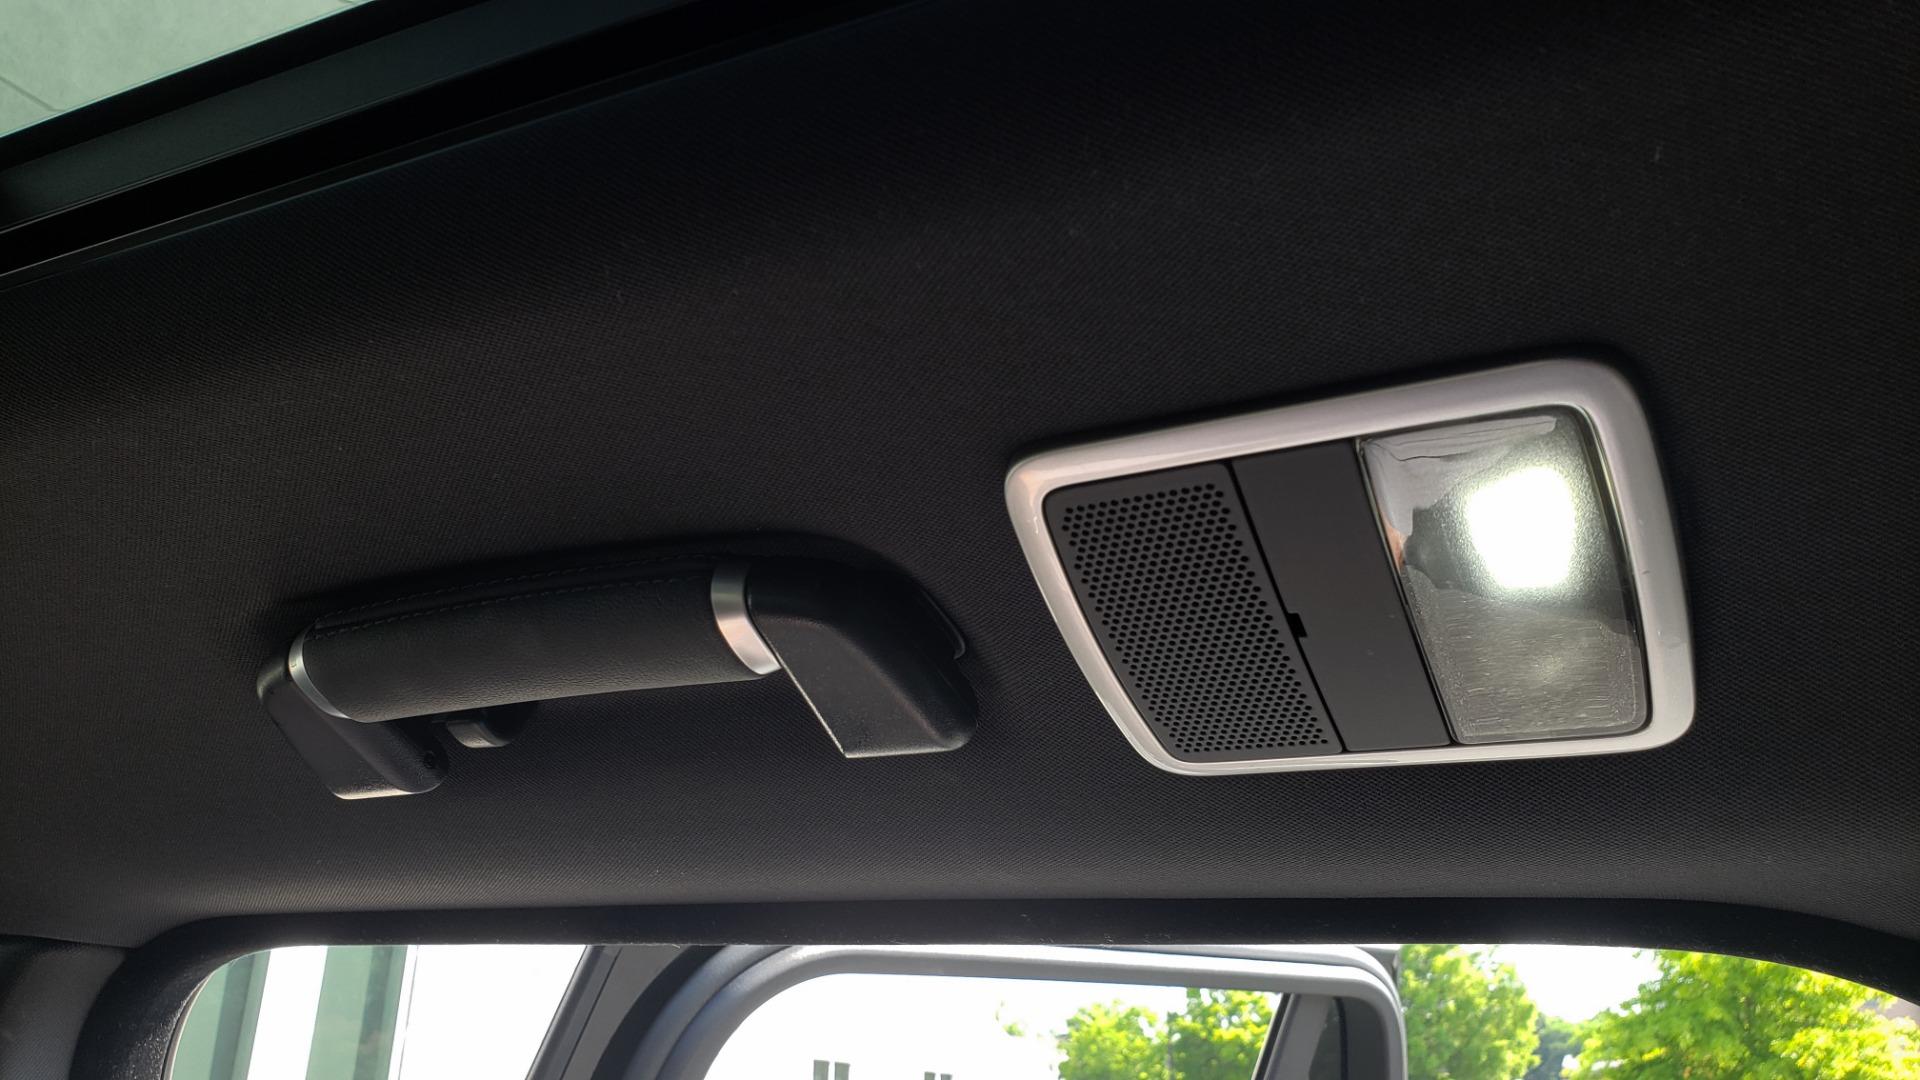 Used 2017 Land Rover RANGE ROVER SC V8 / VISION ASST / DRIVE PKG / MERIDIAN SOUND / PANO-ROOF / NAV / BSM for sale $75,995 at Formula Imports in Charlotte NC 28227 85